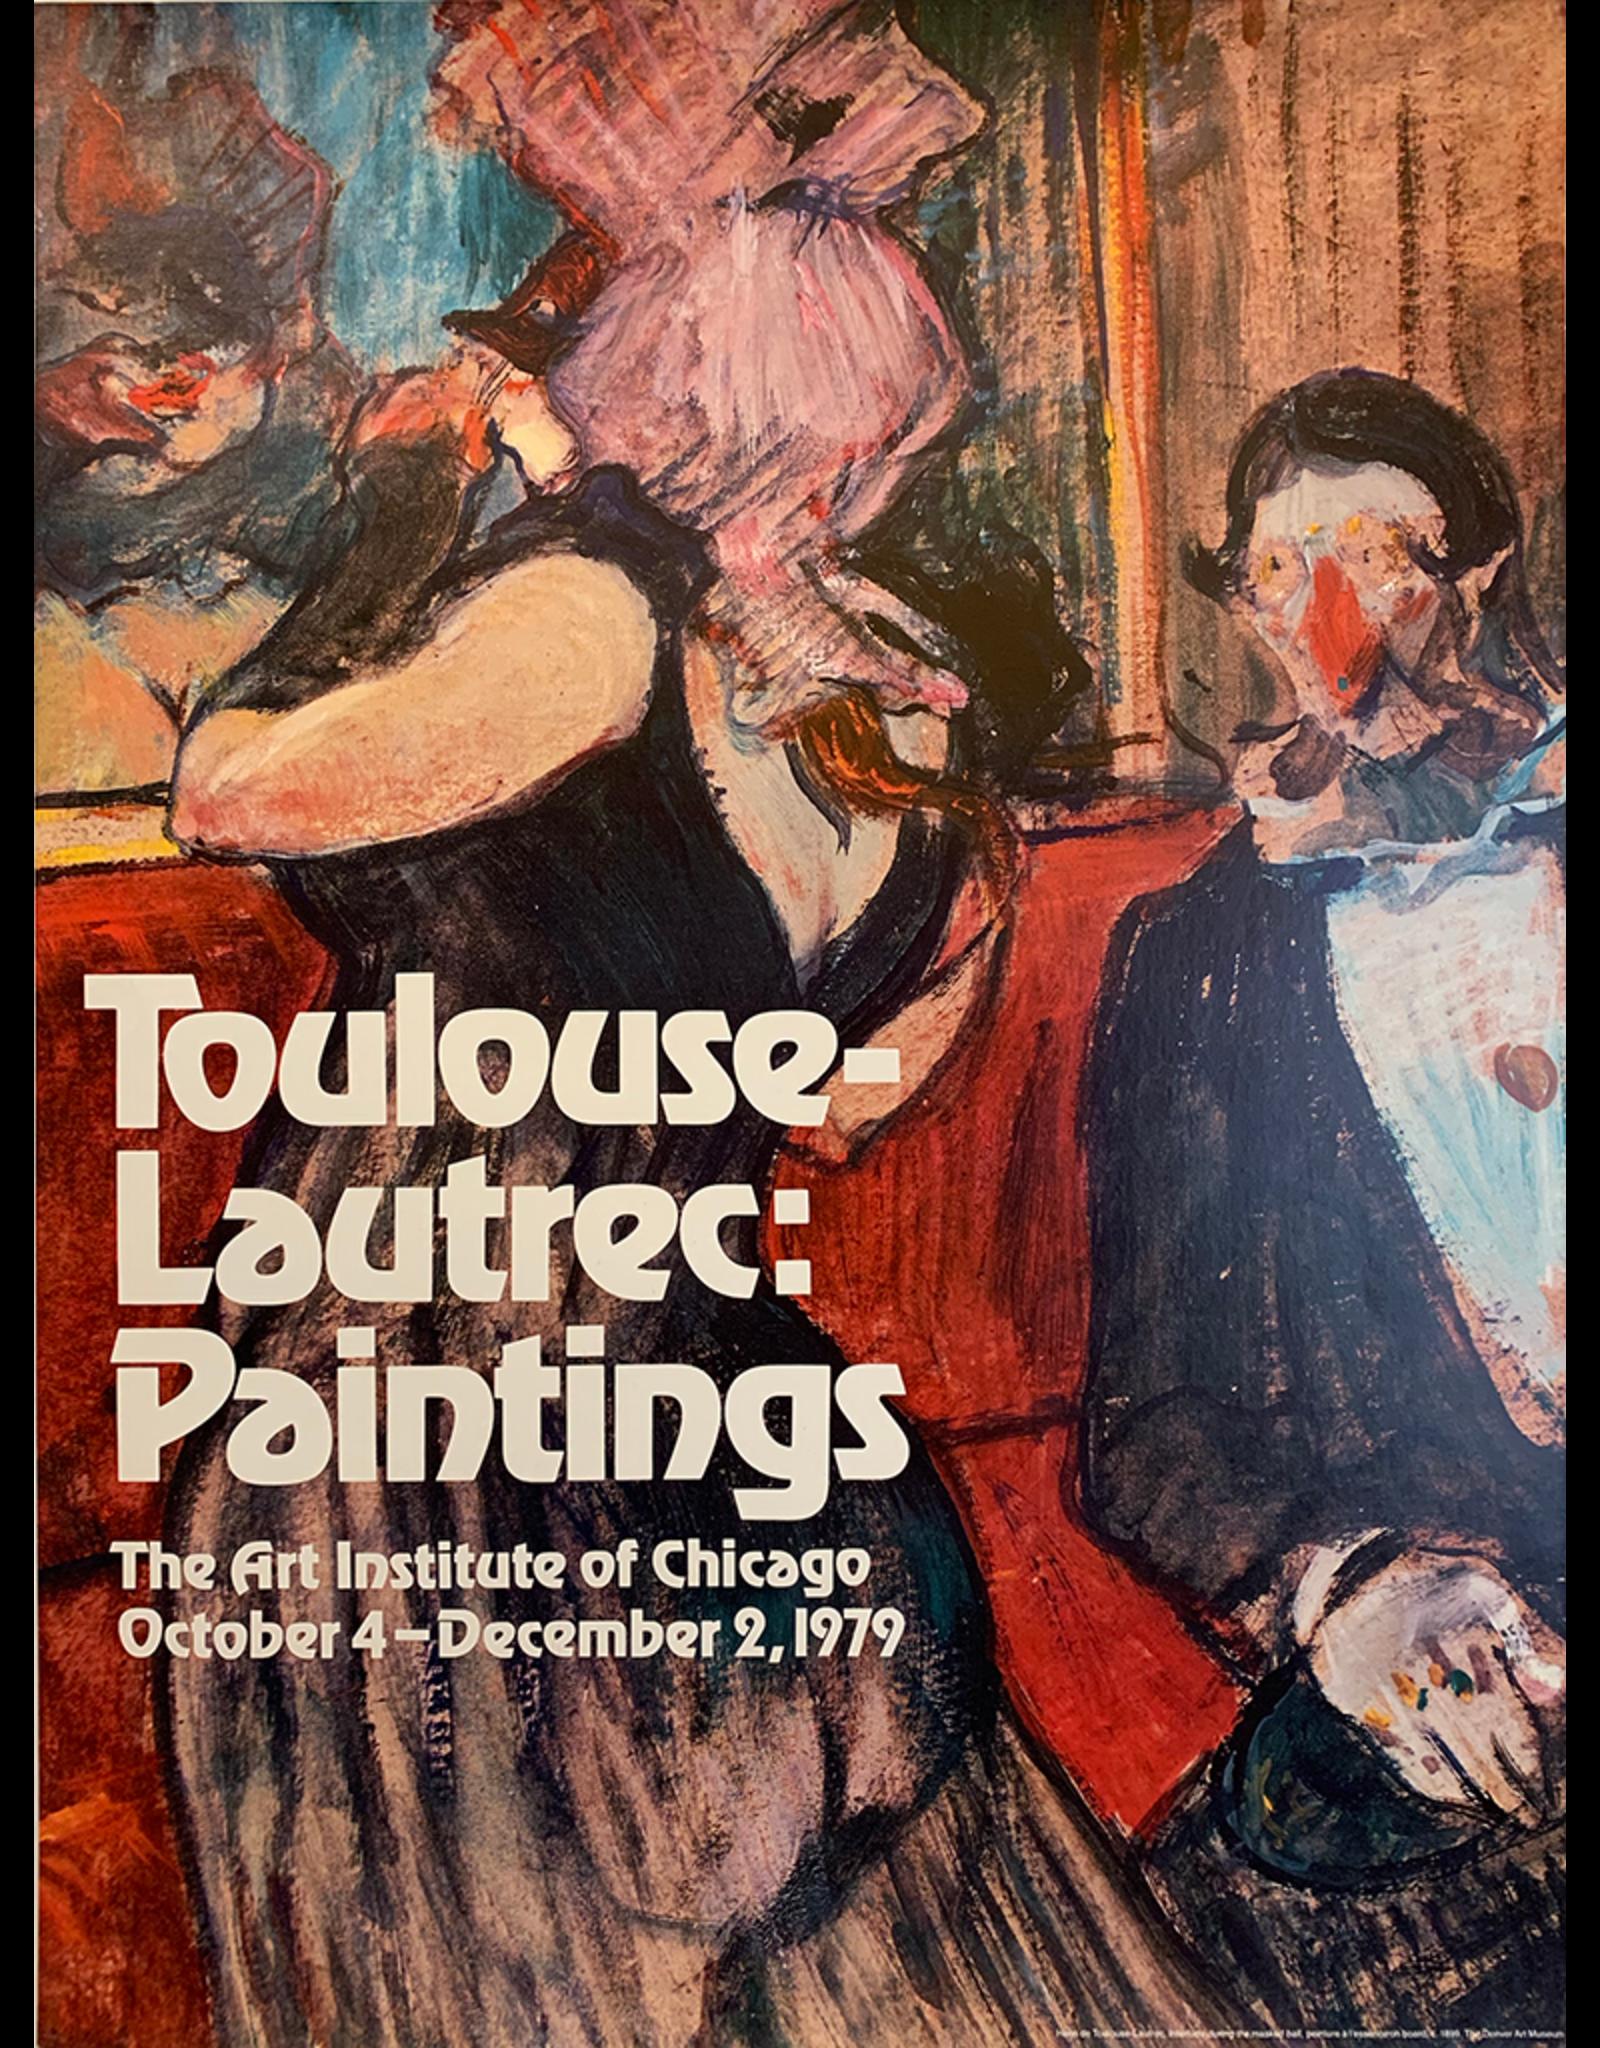 SPV Art Institute of Chicago, Toulouse Lautrec Poster